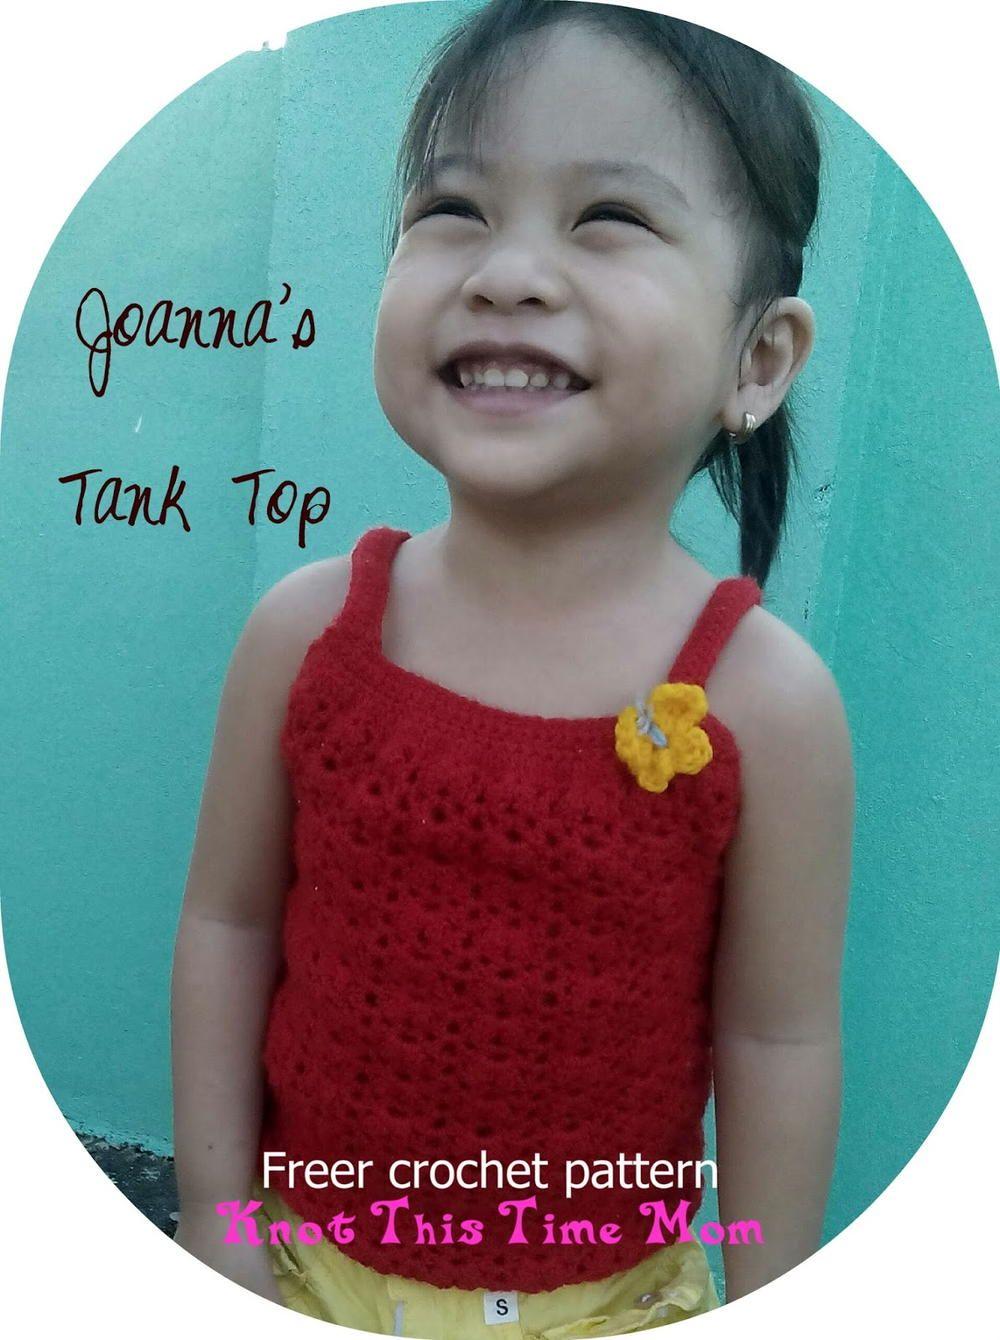 Joannas Crochet Tank Top Crochet Kids Crochet Crochet Patterns